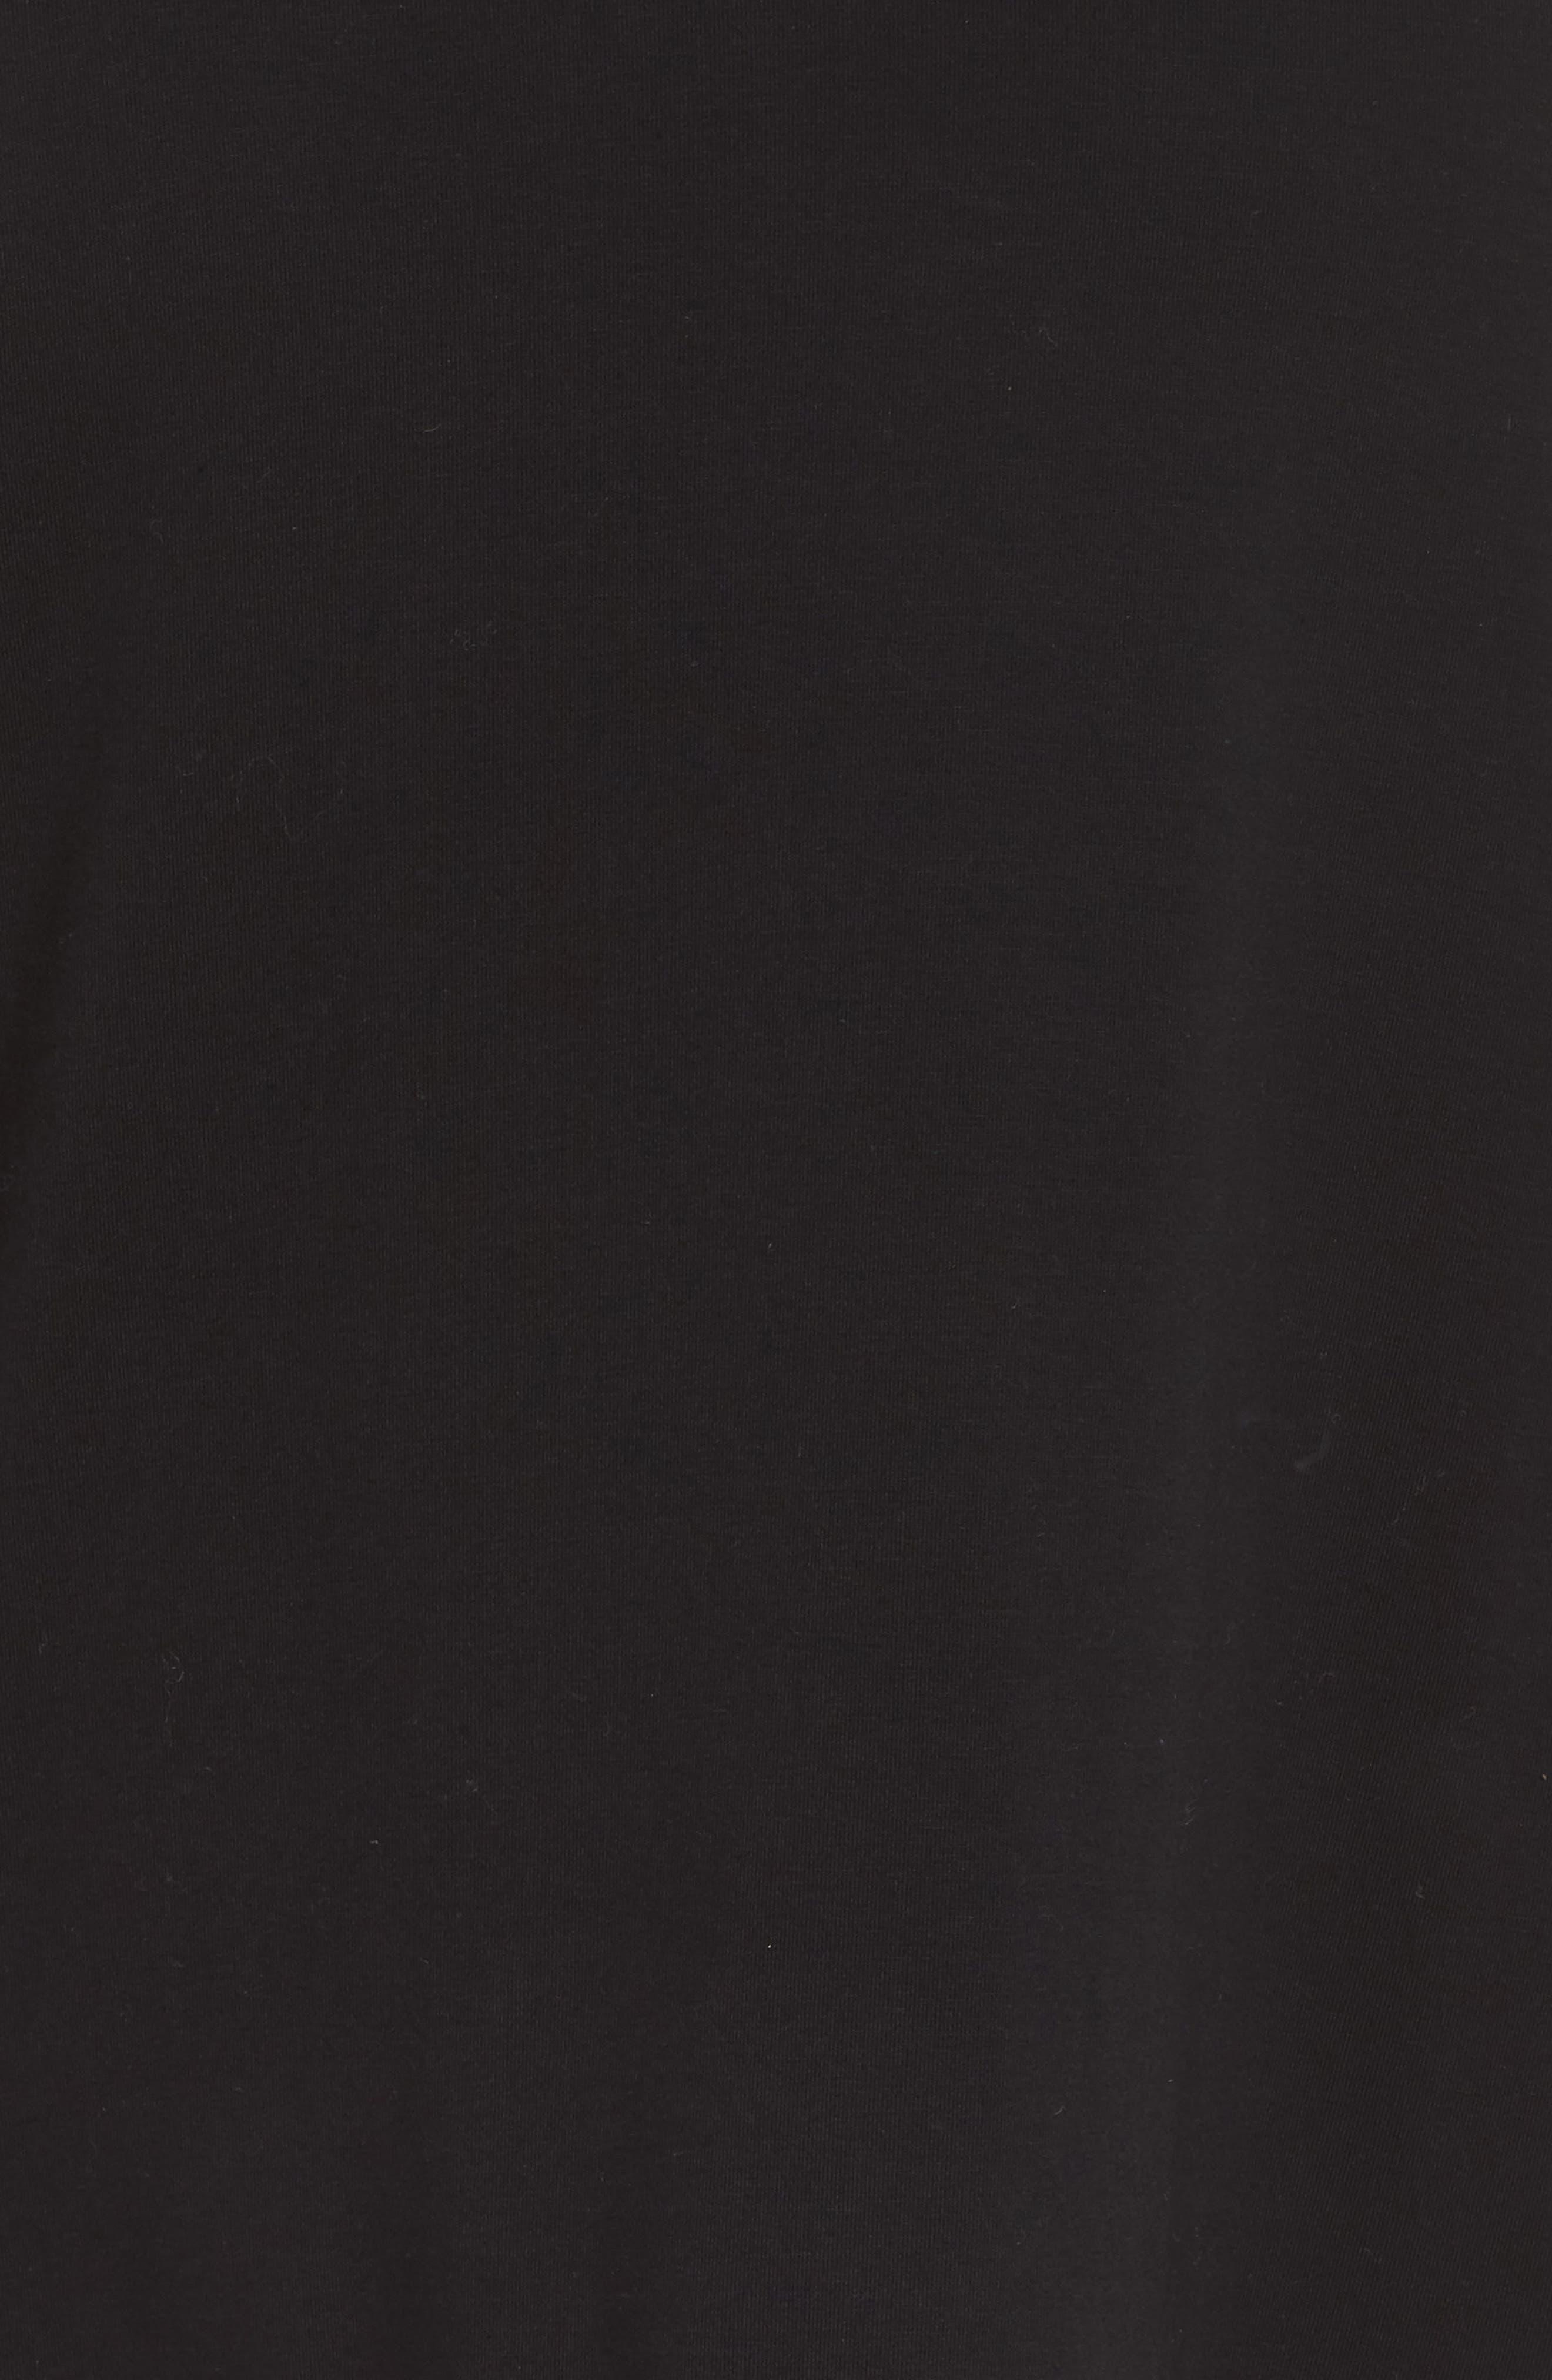 Organic Jersey Side Zip Top,                             Alternate thumbnail 6, color,                             Black